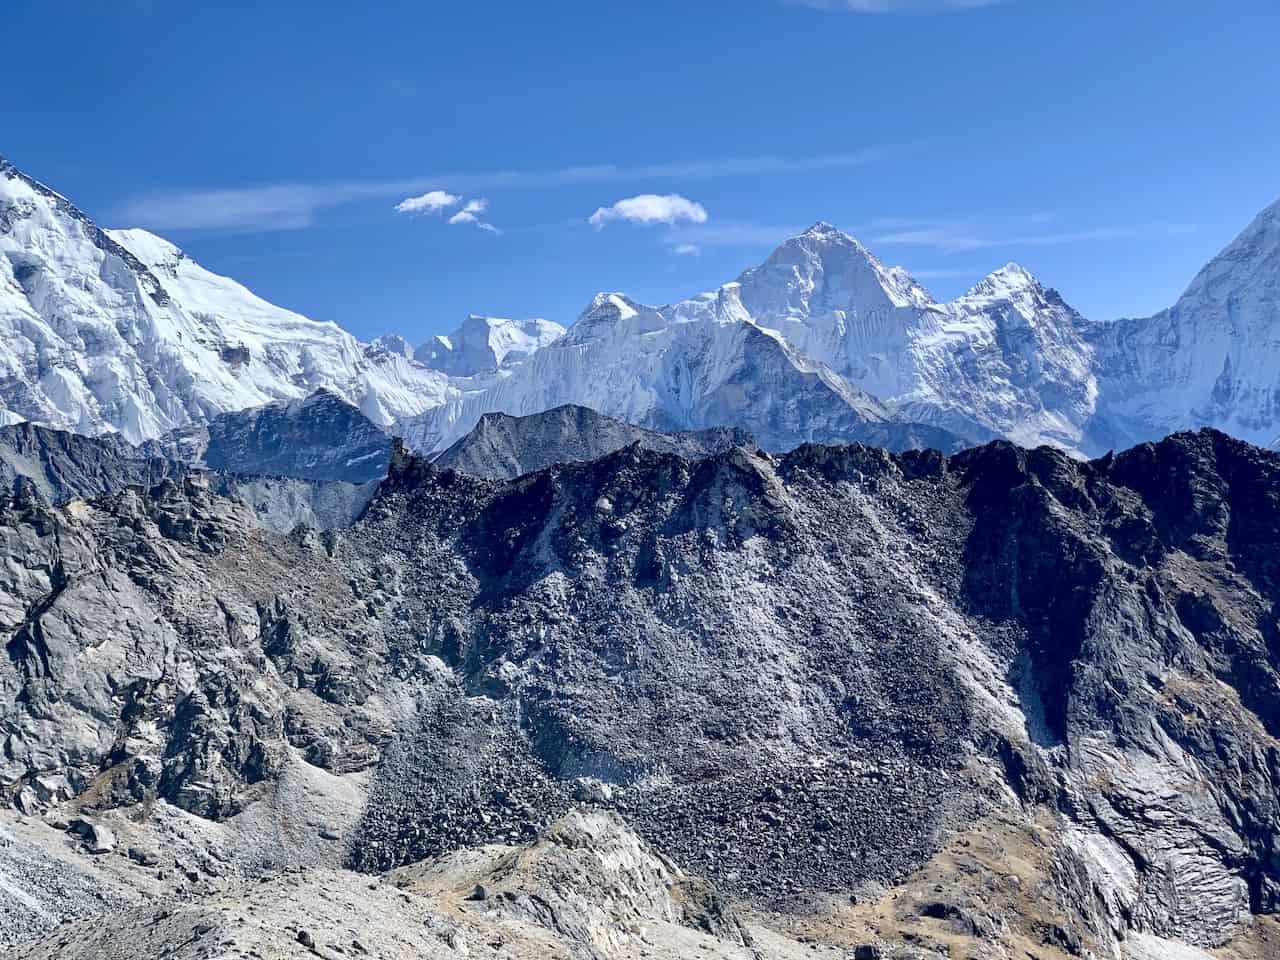 Sagarmatha National Park Everest Region